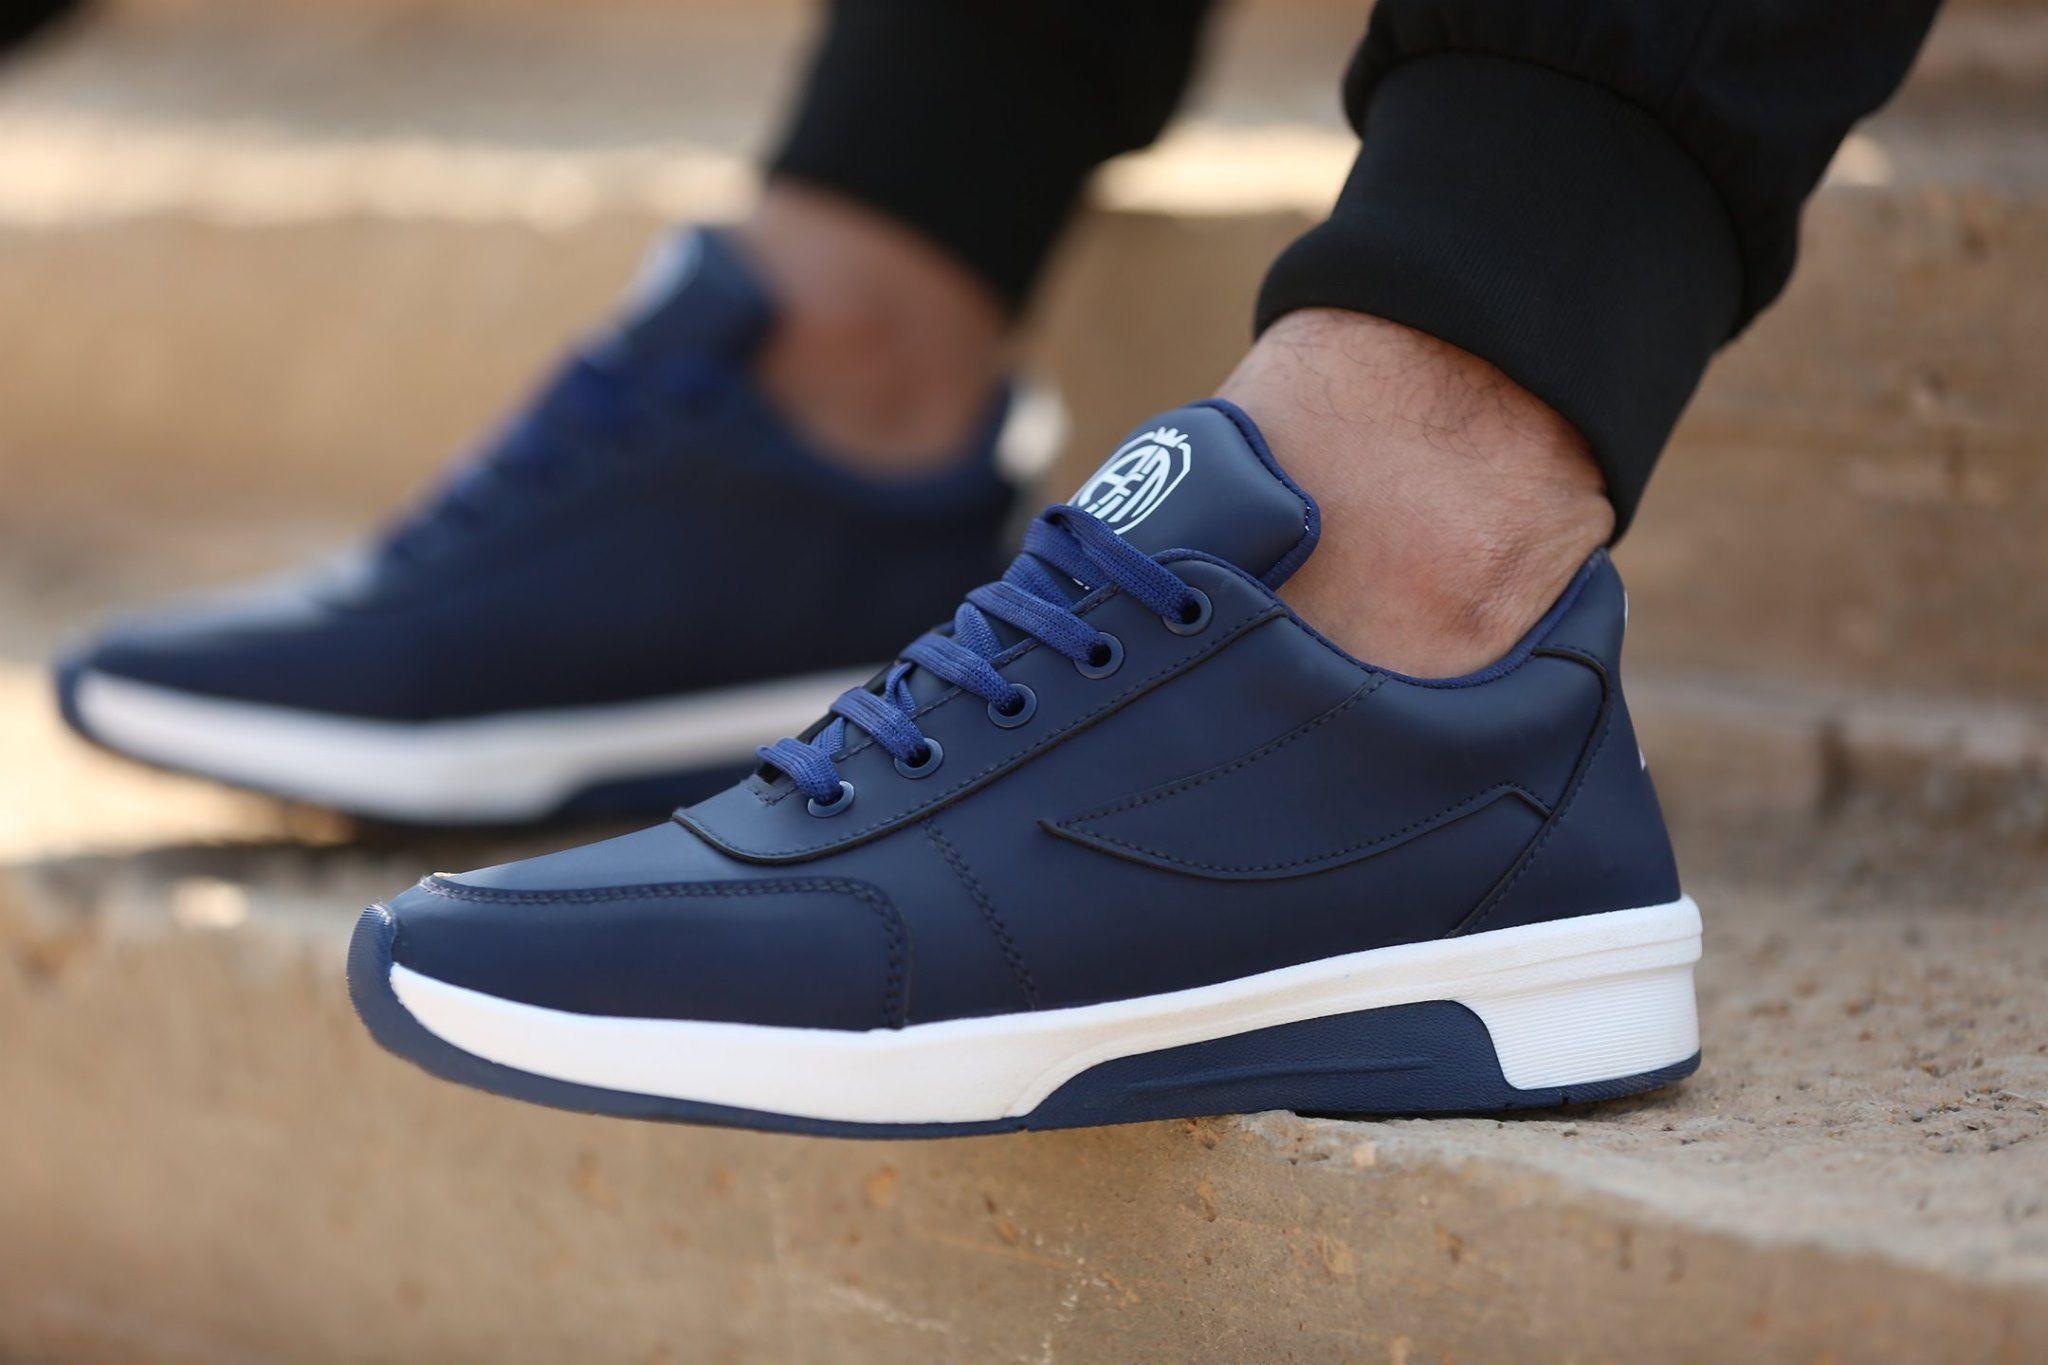 حذاء Amformen اوريجنال اصلي بمميزات الـ1x10 Shoe Brands Sneakers Nike Sneakers